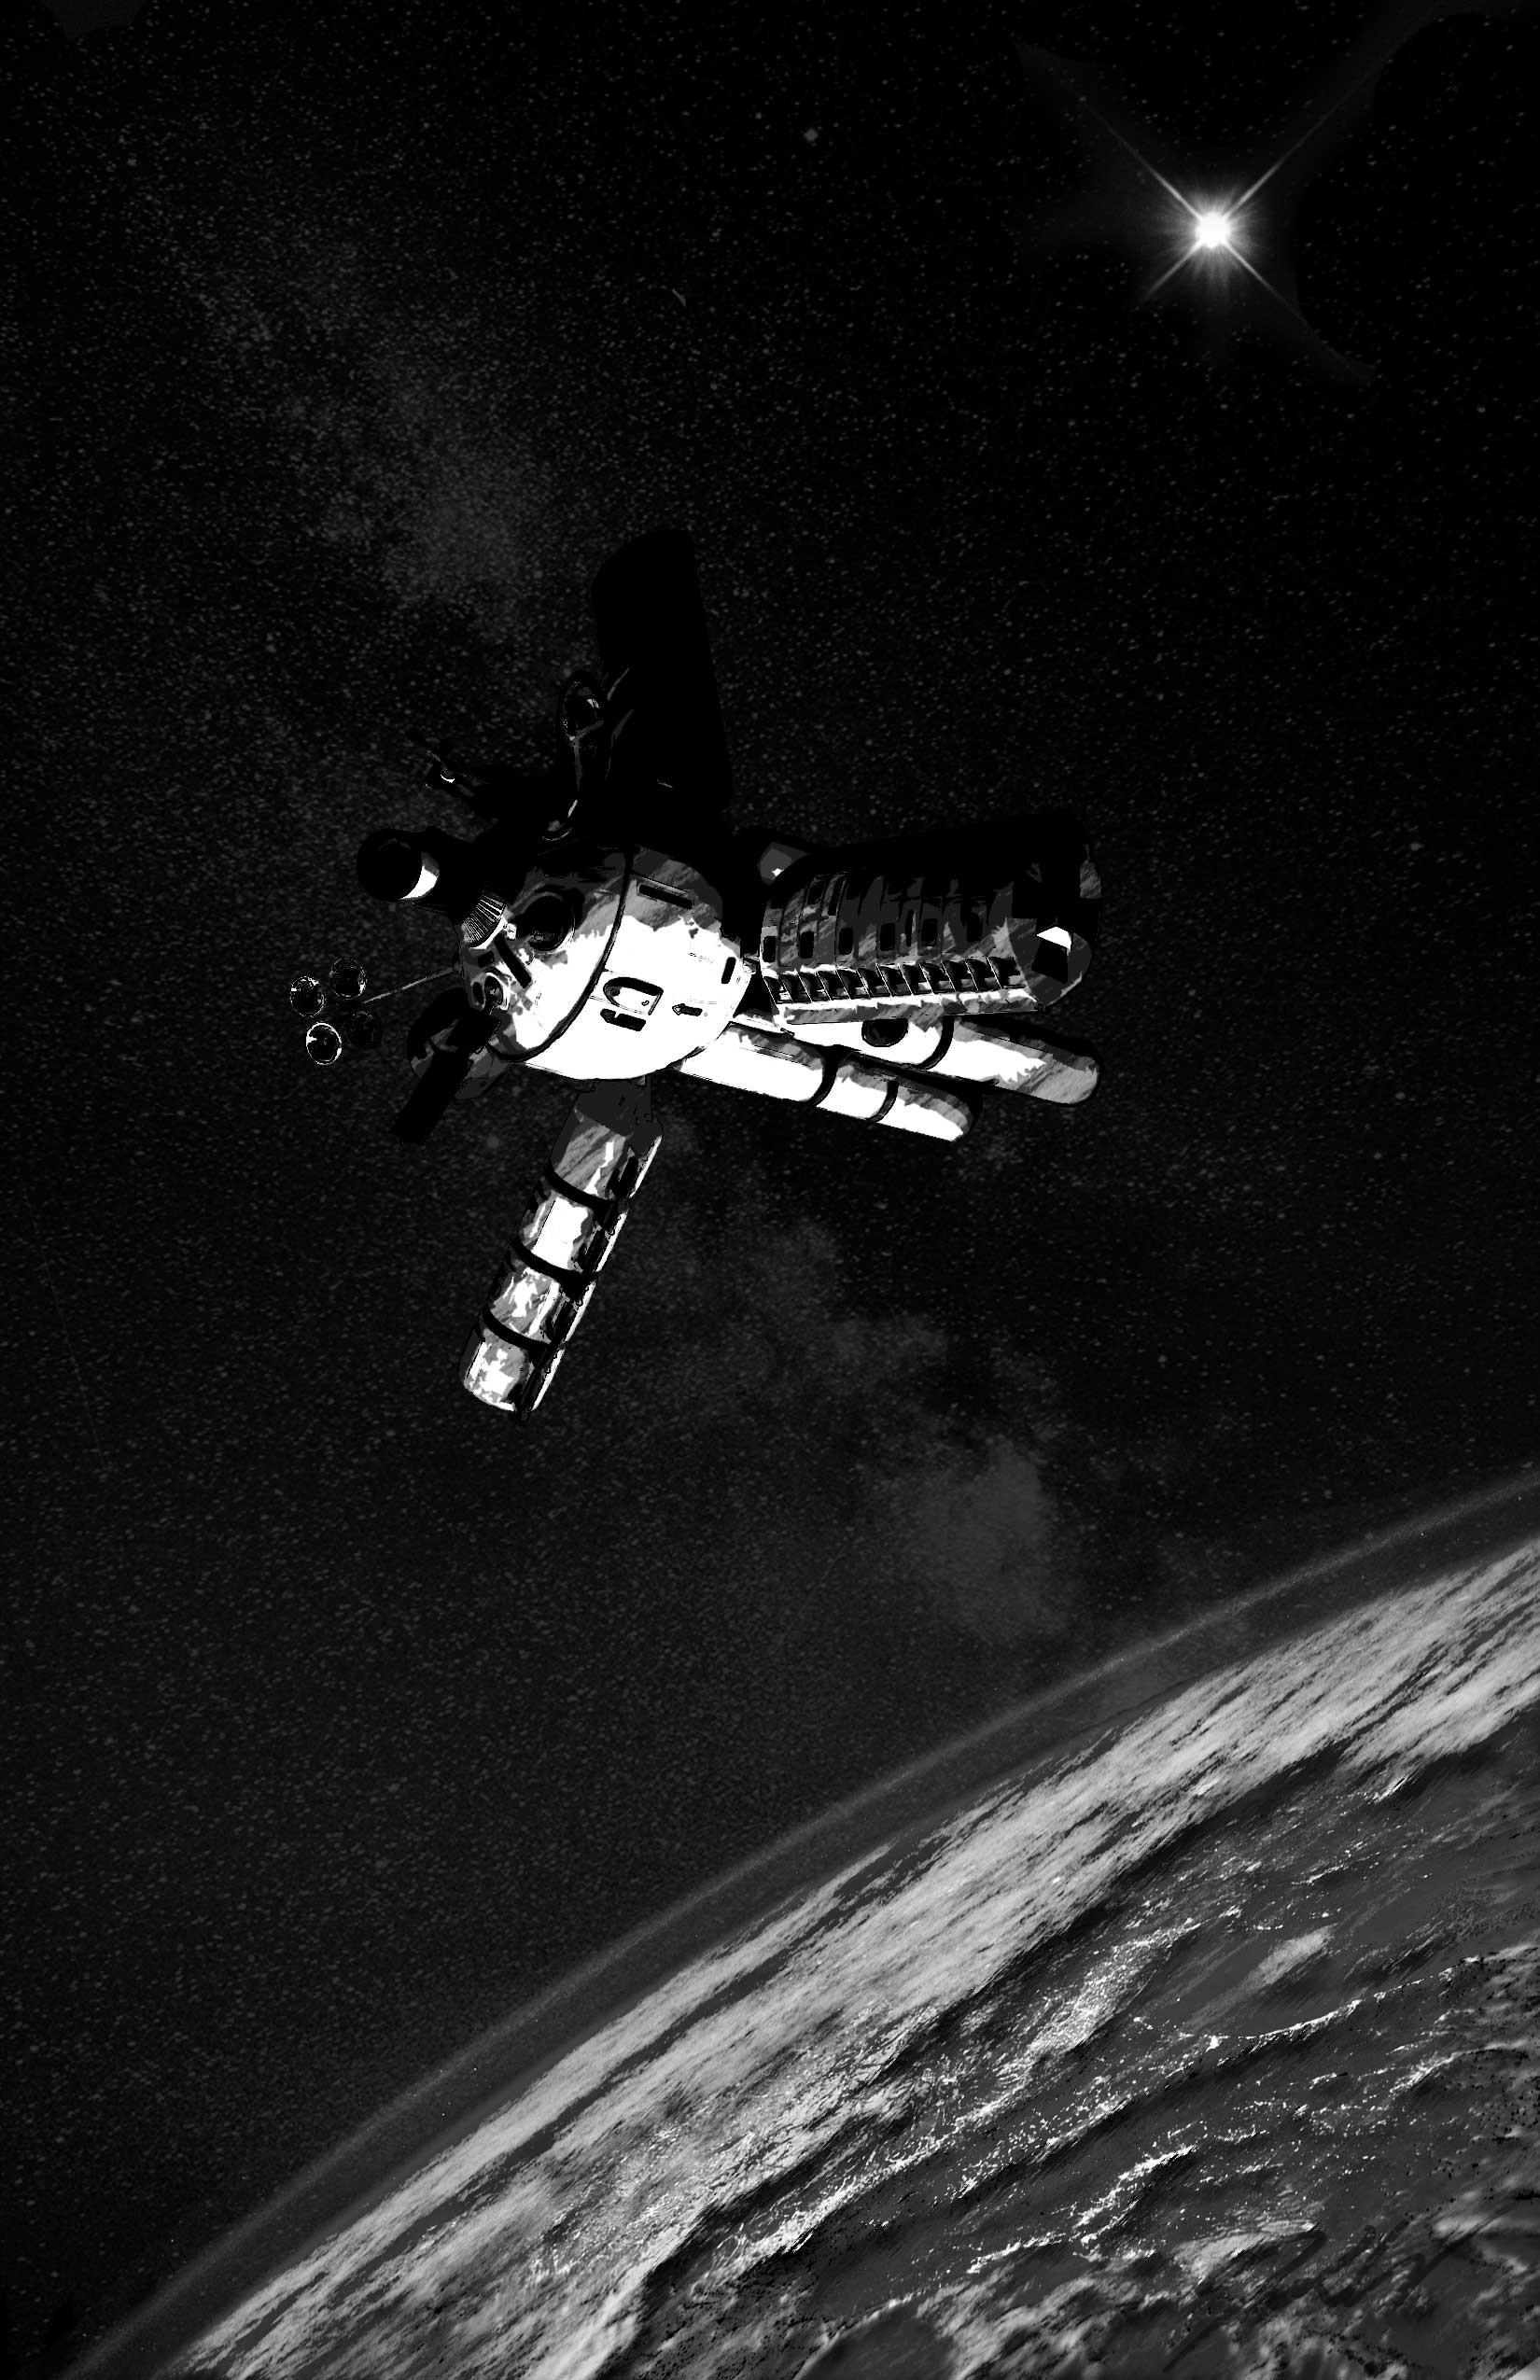 Space Hab 14 – Greyscale